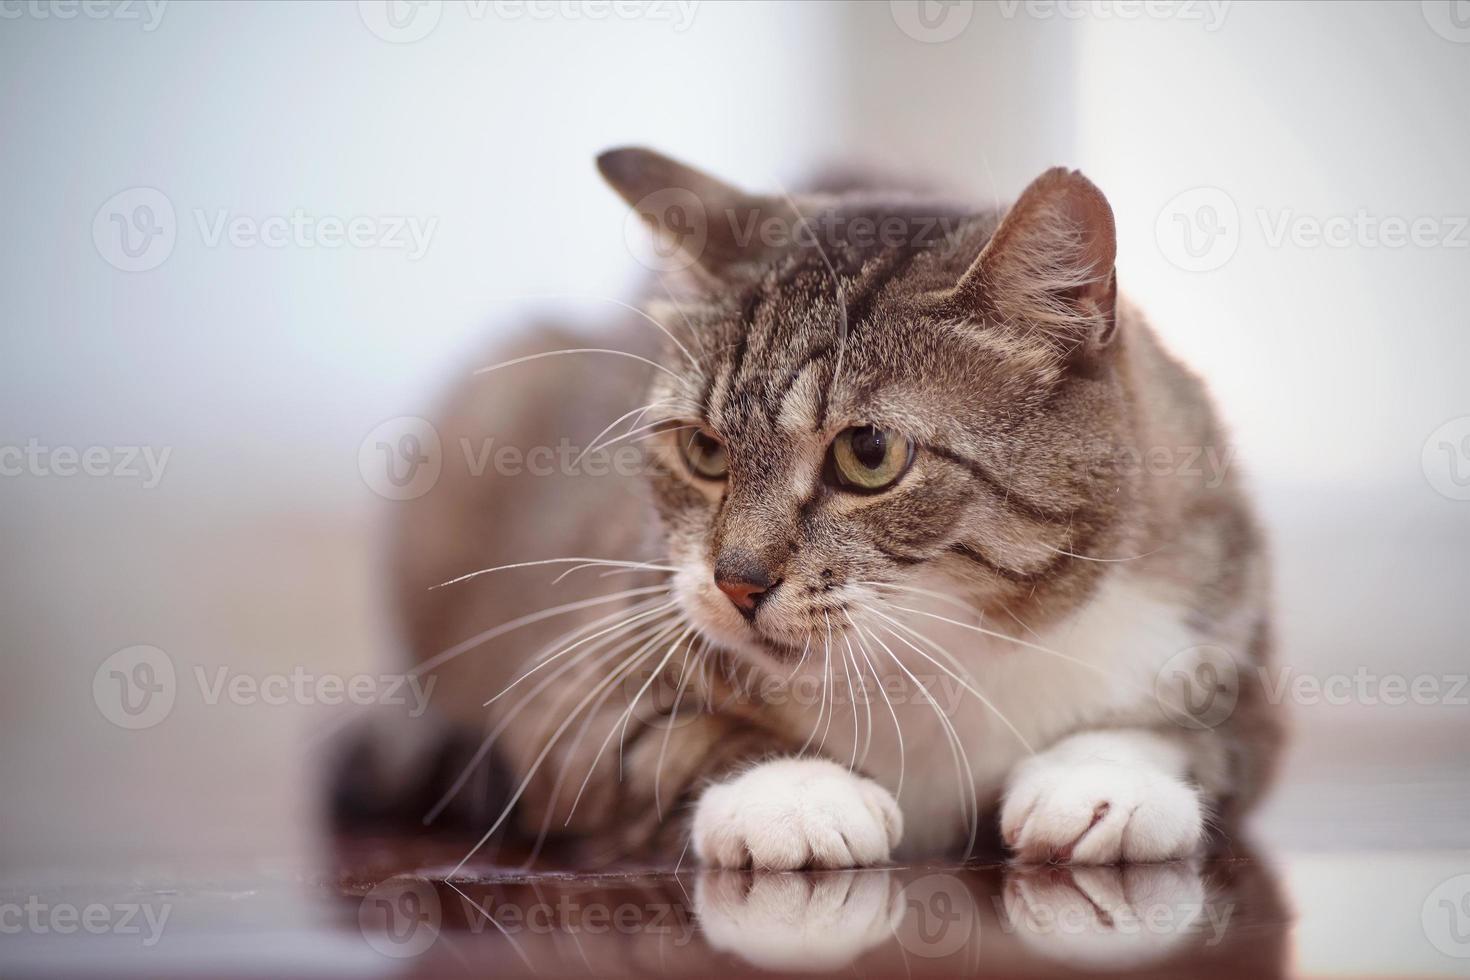 bravo gato listrado cinza com olhos verdes. foto